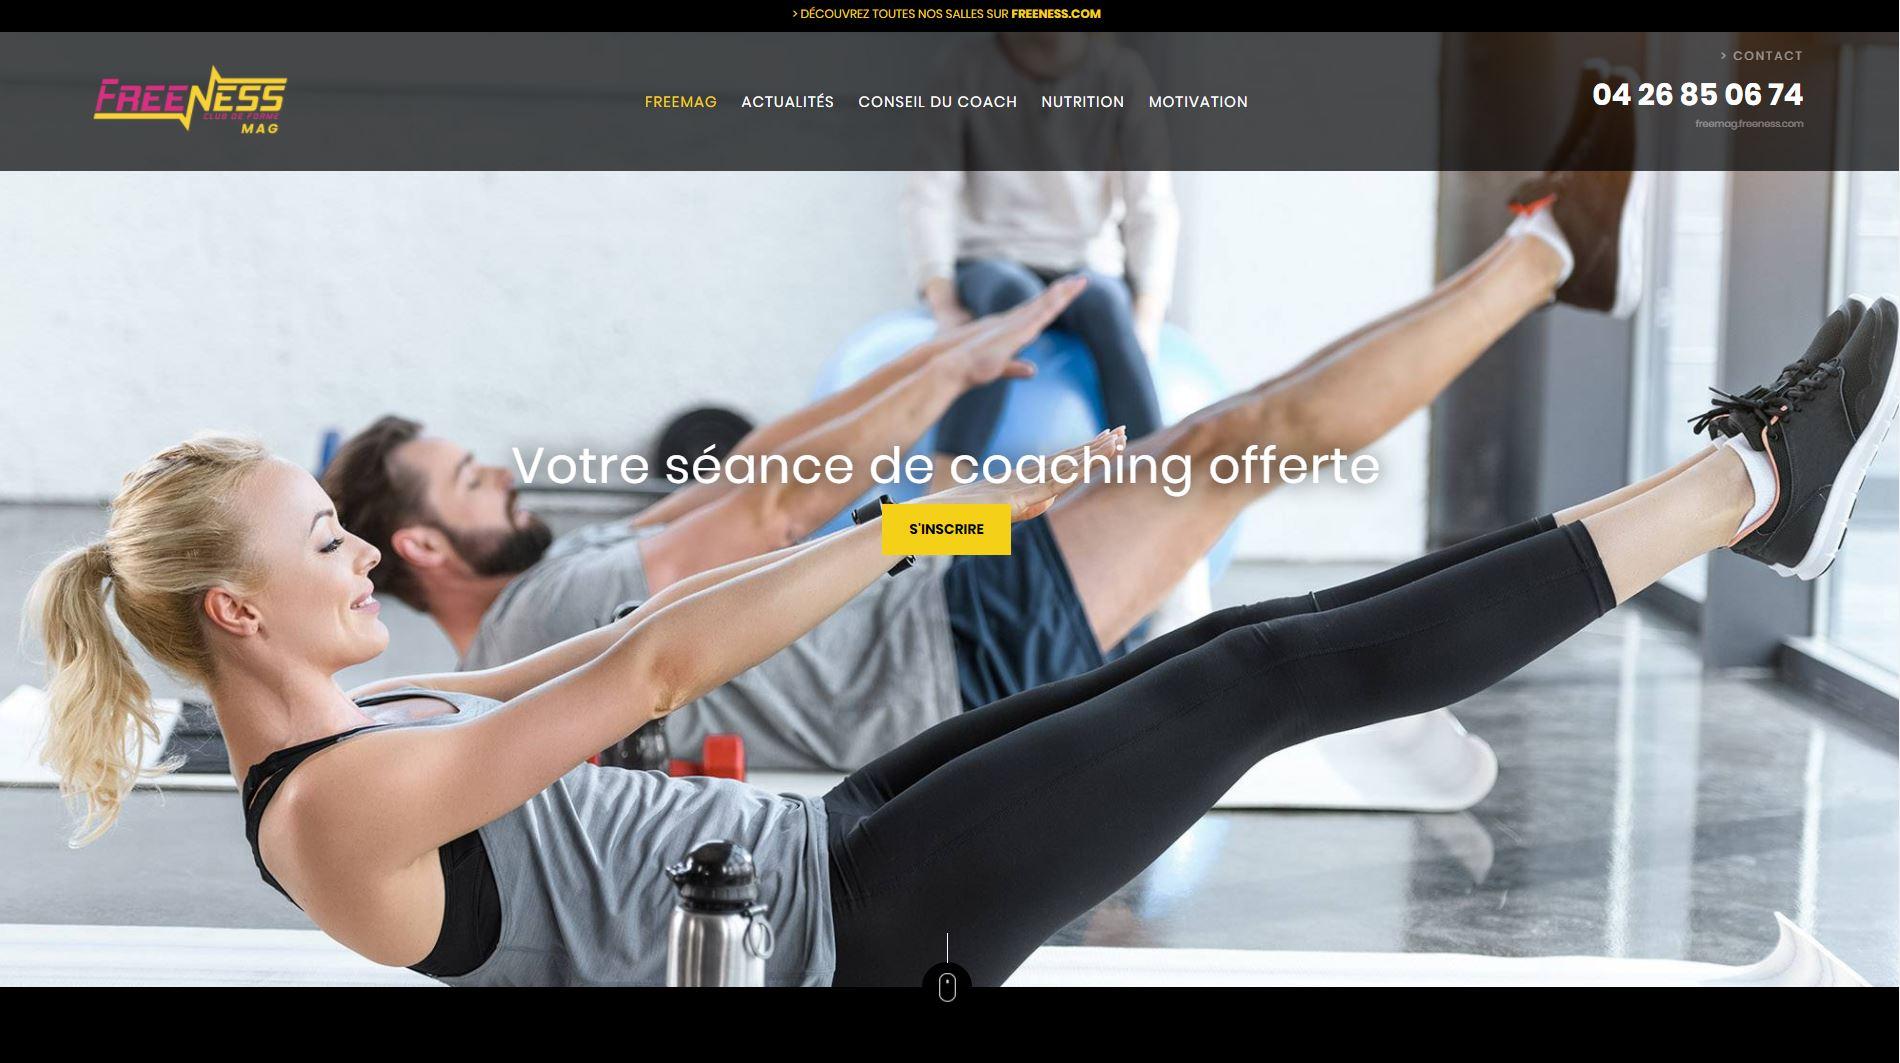 Magazine en ligne de sport et fitness